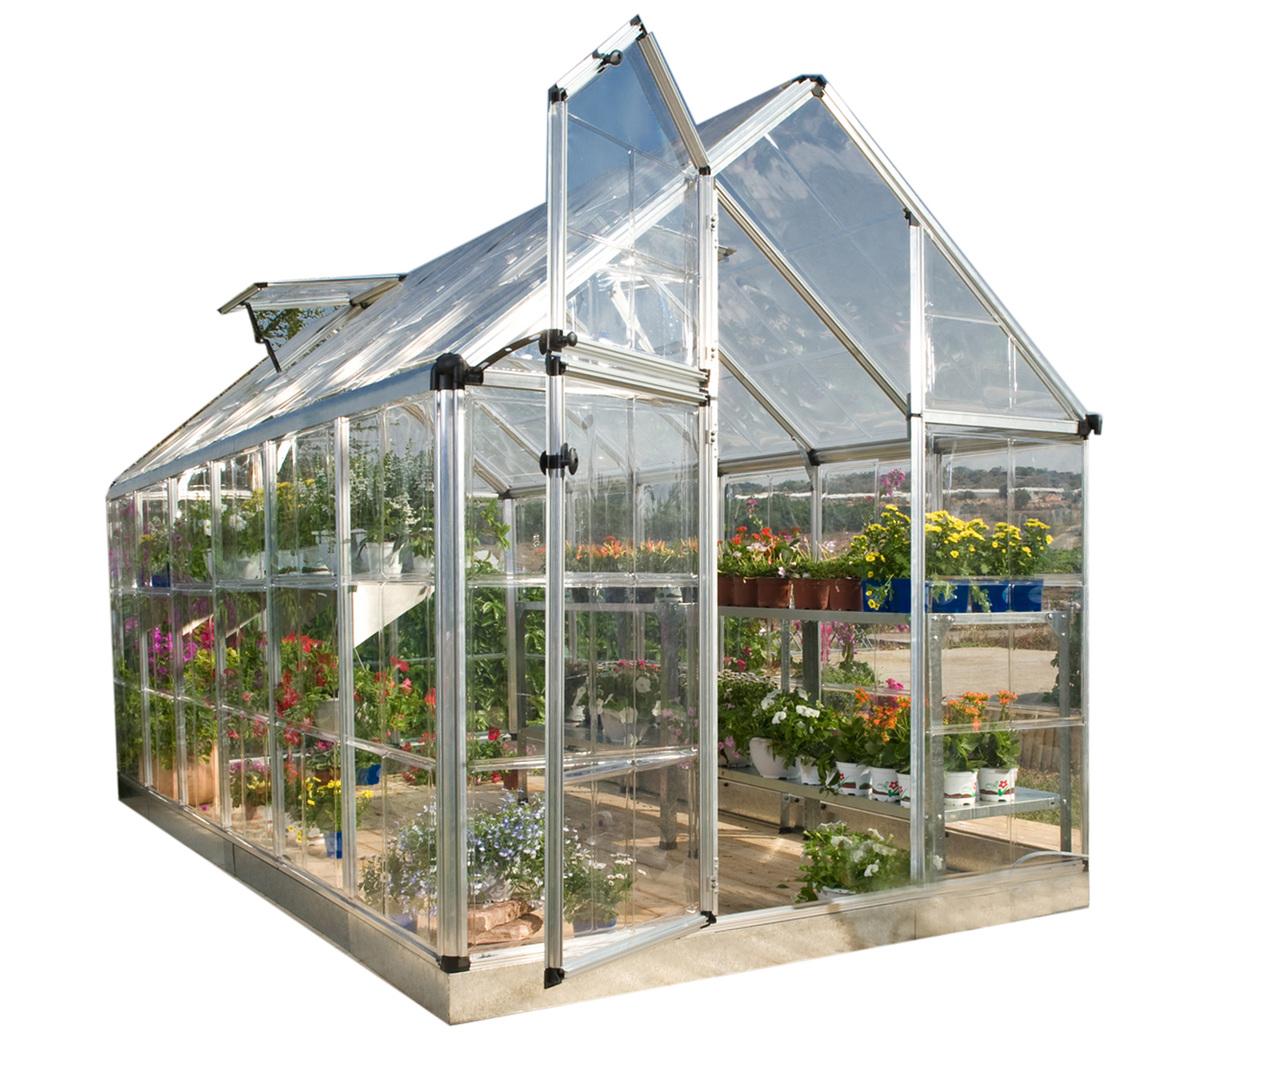 Palram Snap & Grow 6' x 16' Hobby Greenhouse - Silver